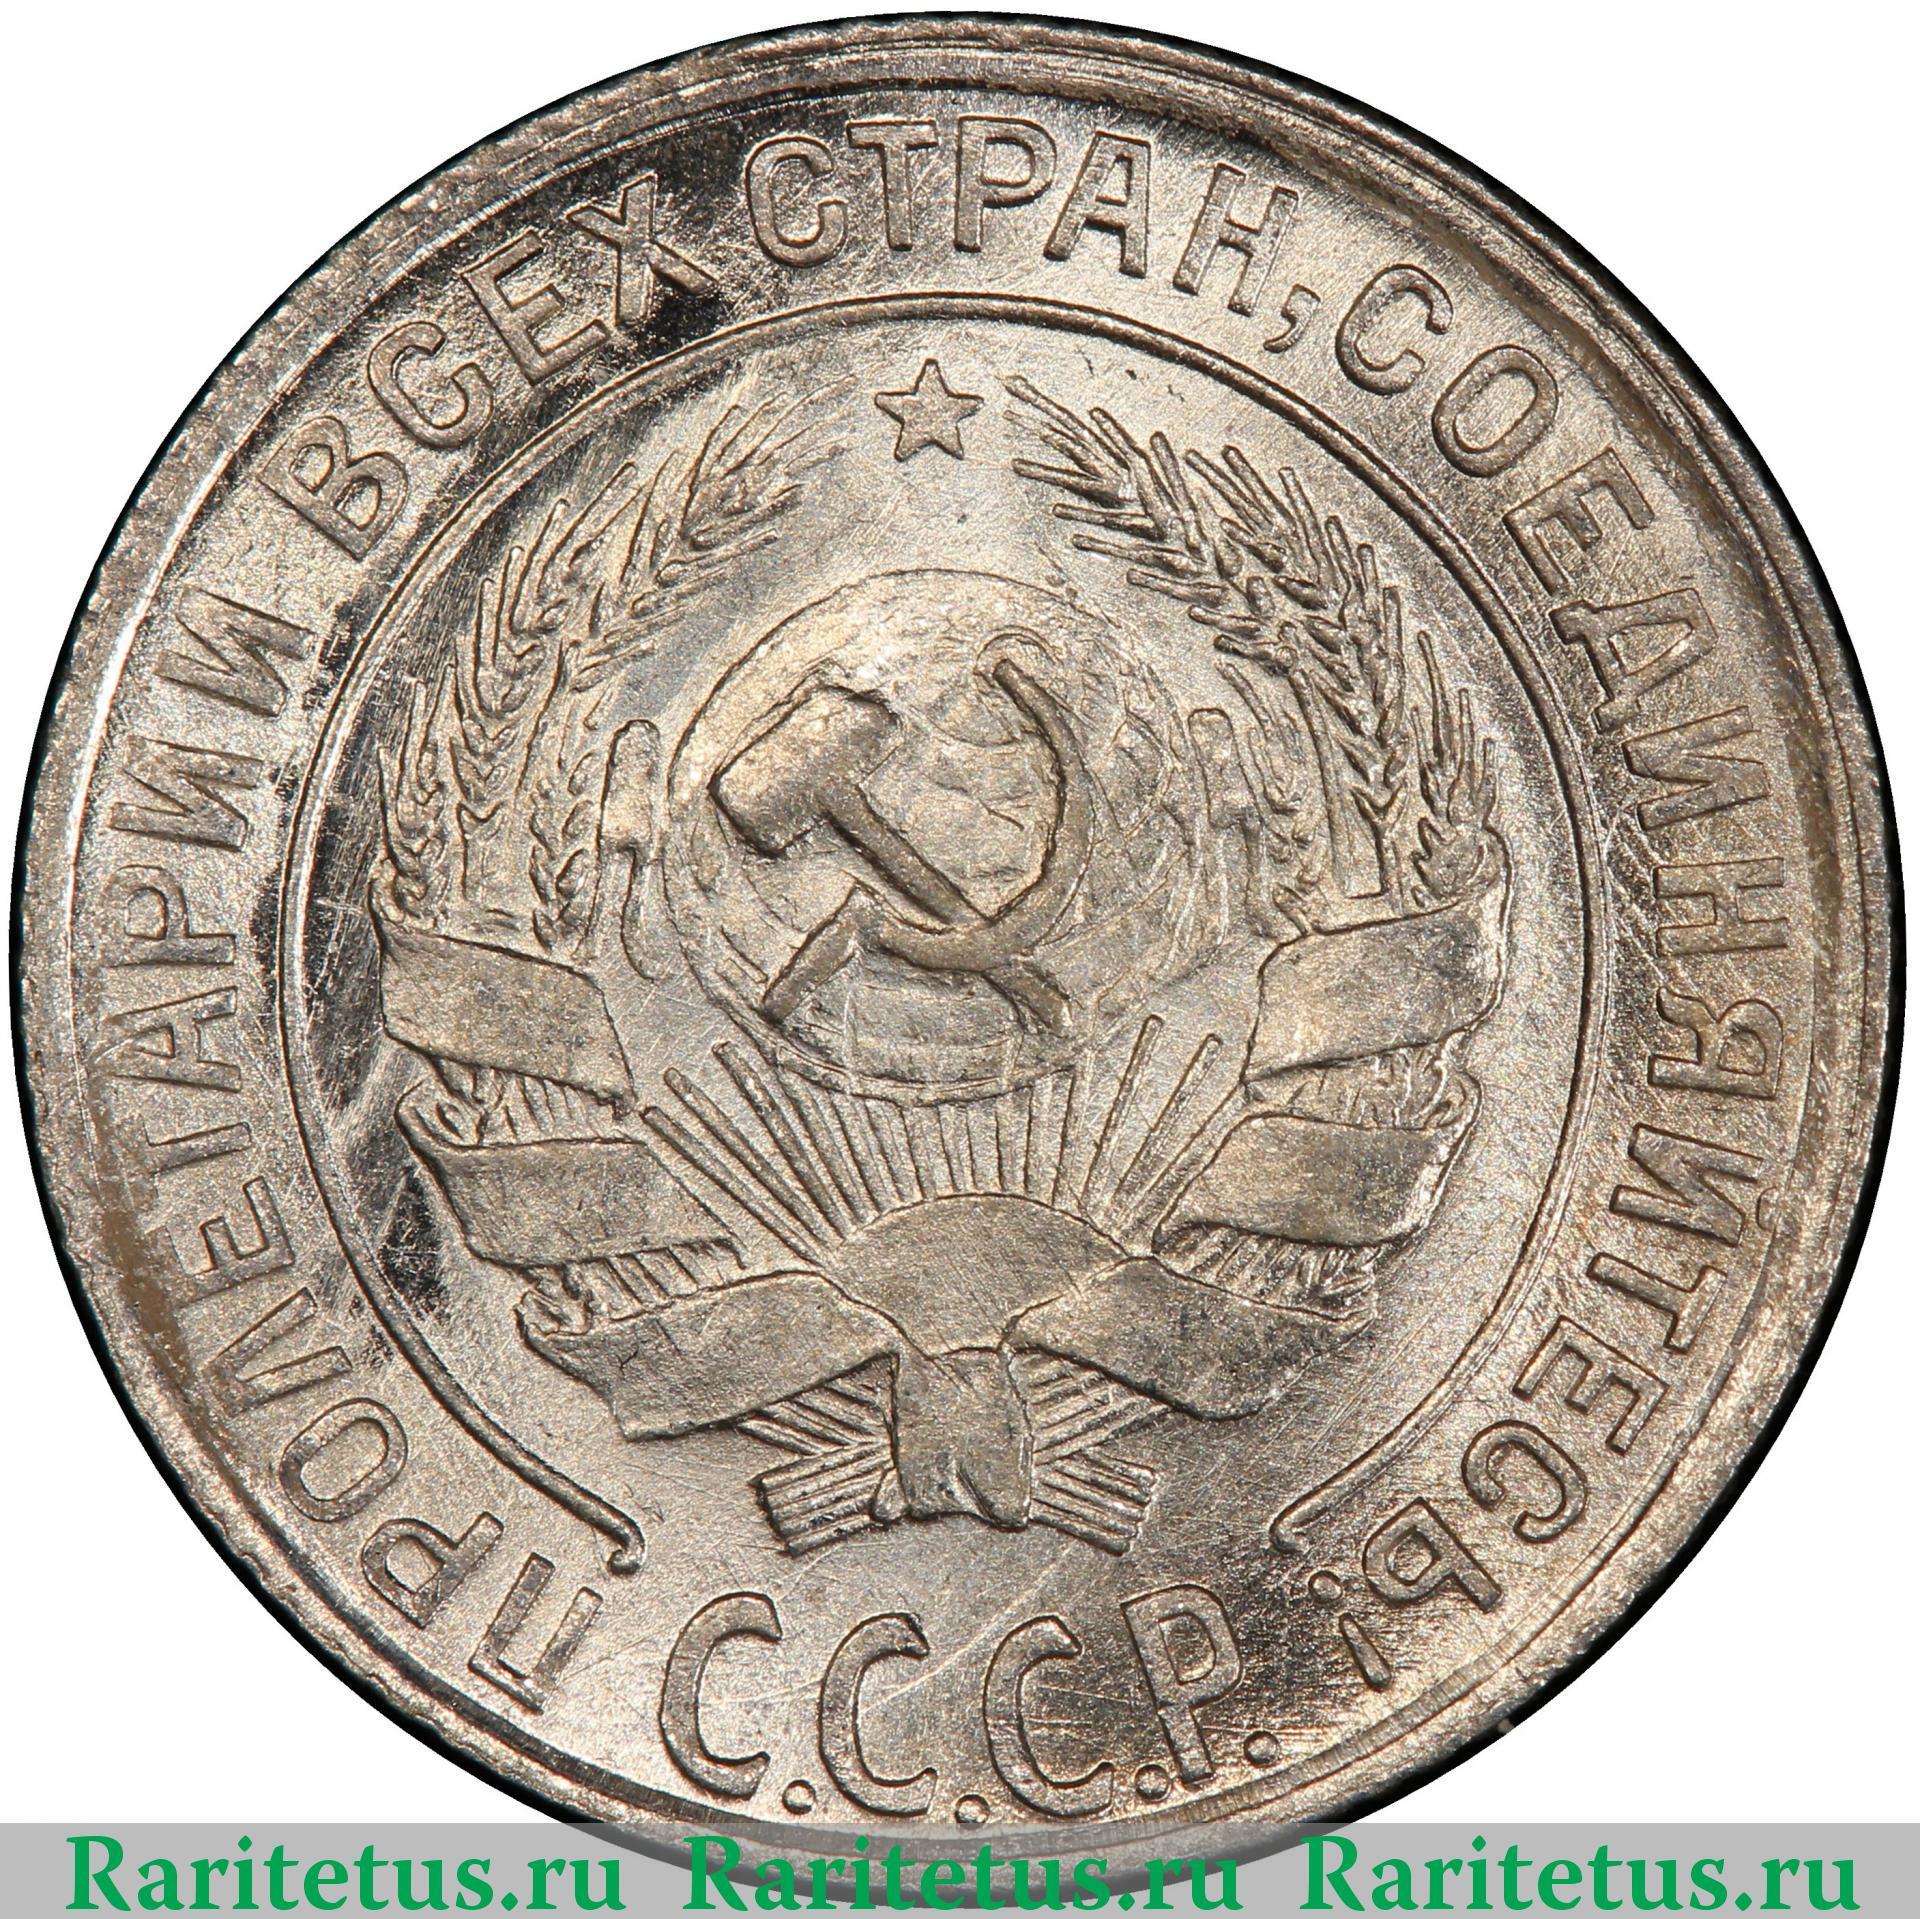 вес монеты 1 евро